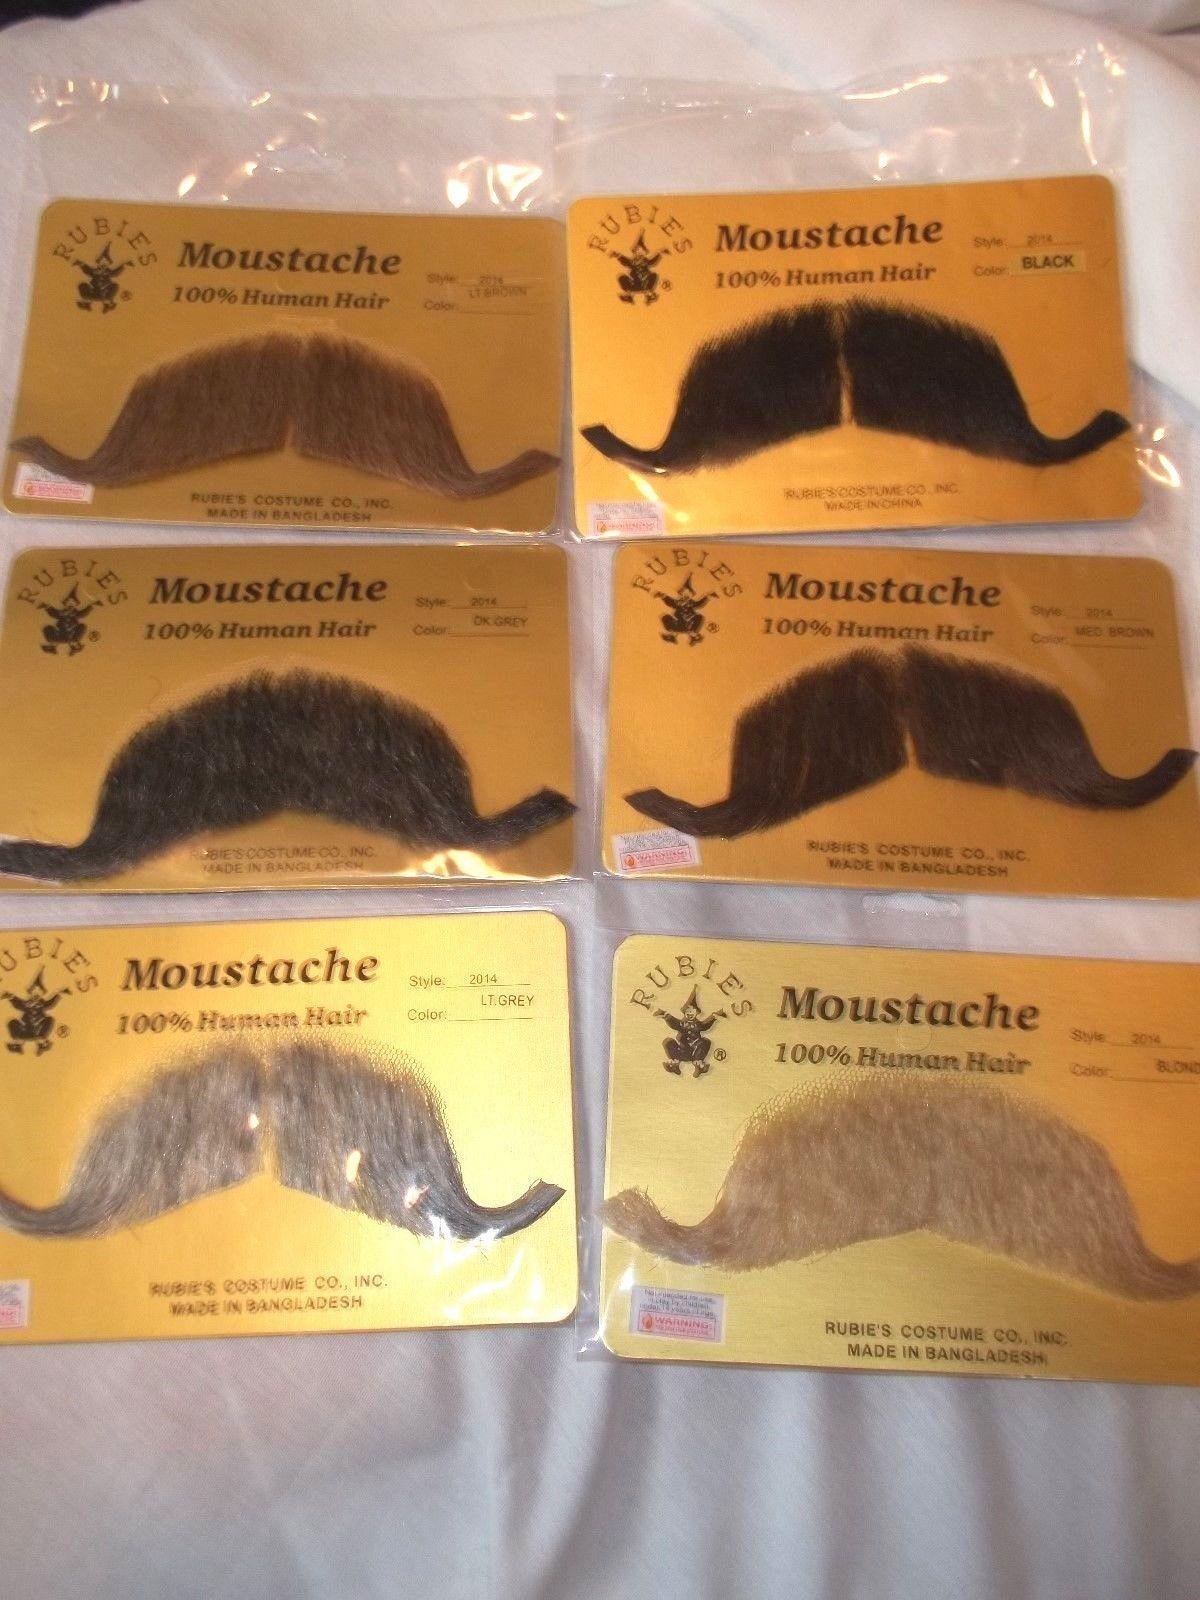 Moustache Human Hair Professional Rubies # 2013 Greys Browns Bld Blk Handlebar